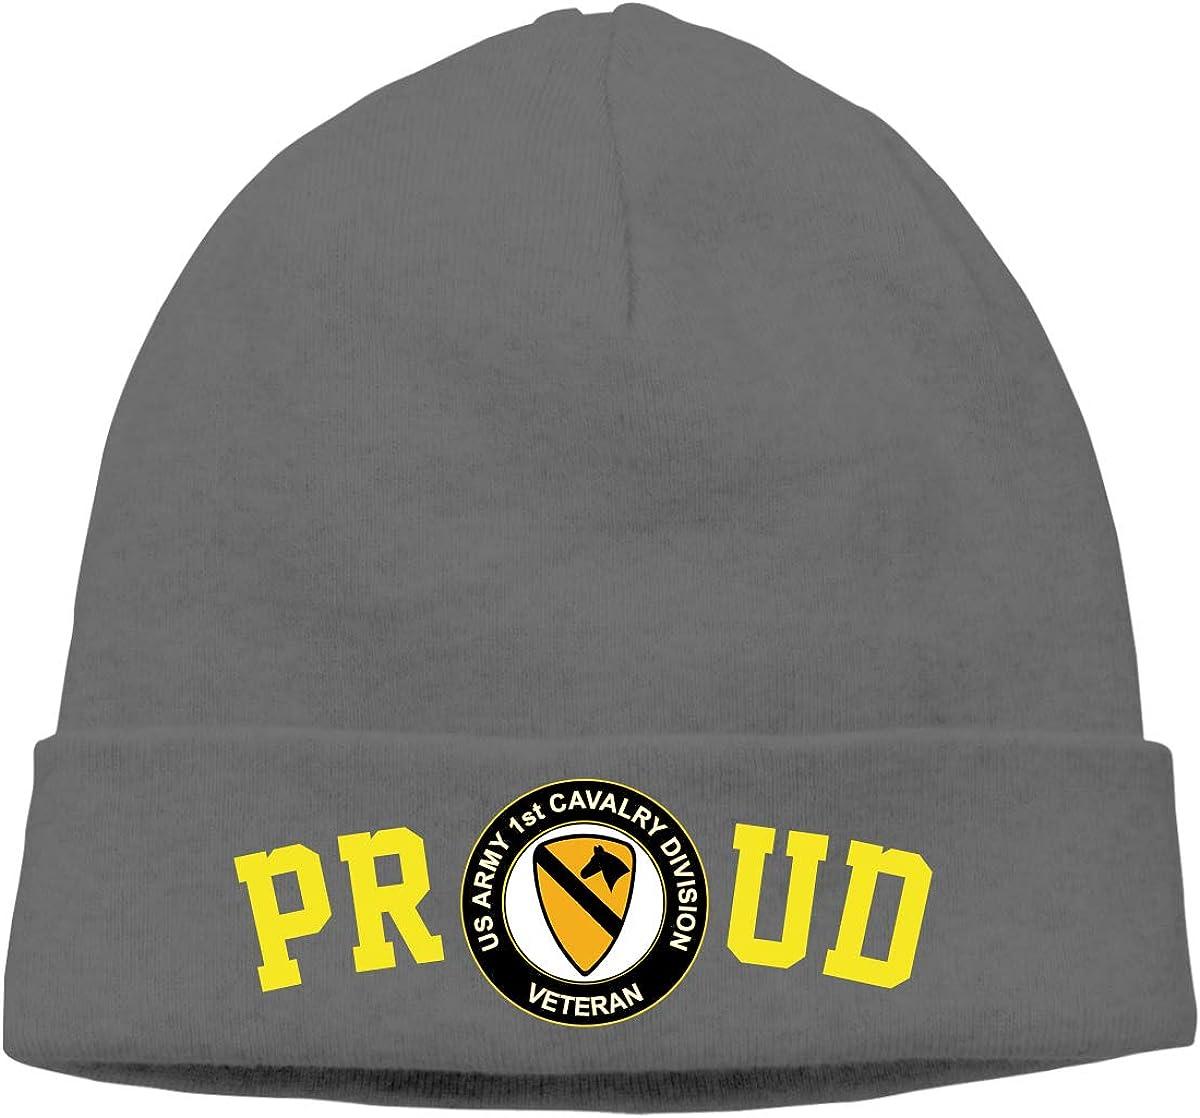 FORDSAN CP Proud US Army Veteran 1st Cavalry Division Mens Beanie Cap Skull Cap Winter Warm Knitting Hats.